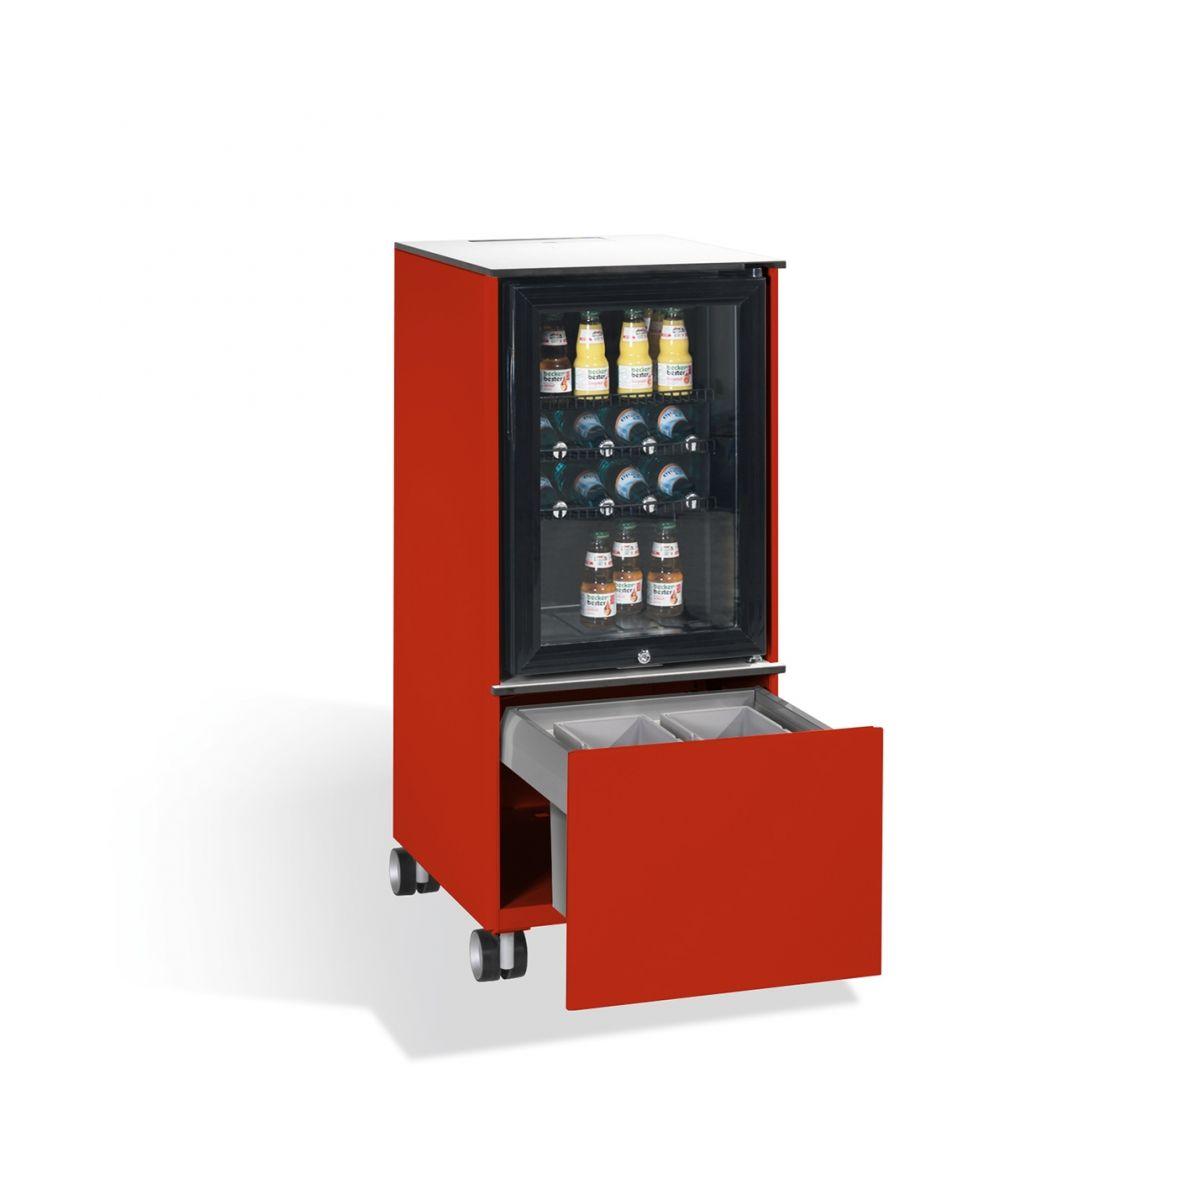 Kühlschrank Caddy mit Abfallsammler sienarot